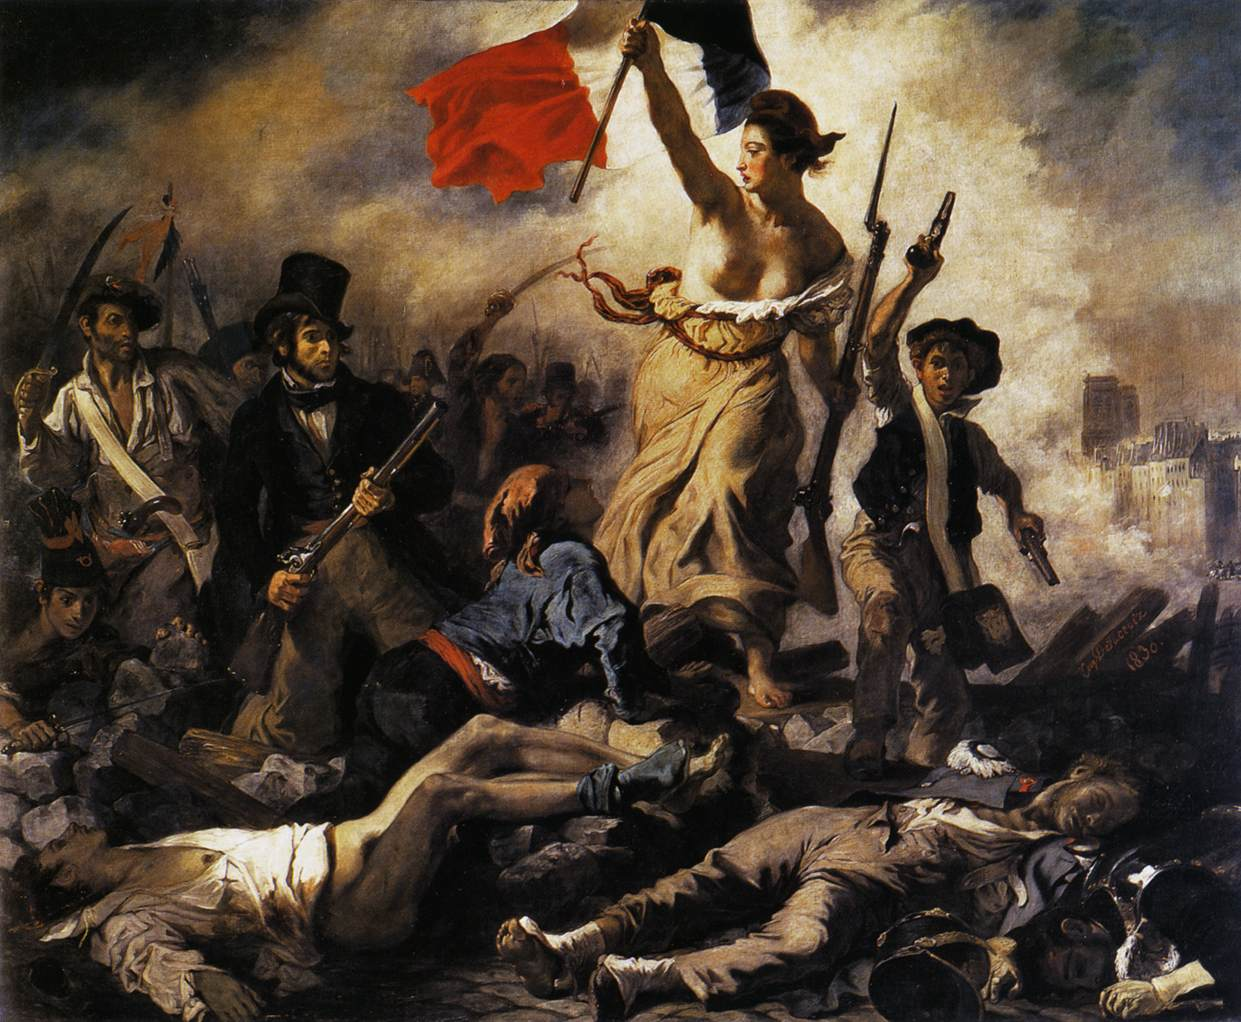 http://3.bp.blogspot.com/-Rtus0e8K2oY/Tq7arCUPBpI/AAAAAAAAADM/jcuGuHKYa6k/s1600/delacroix-liberdade-guiando-o-povo.jpg